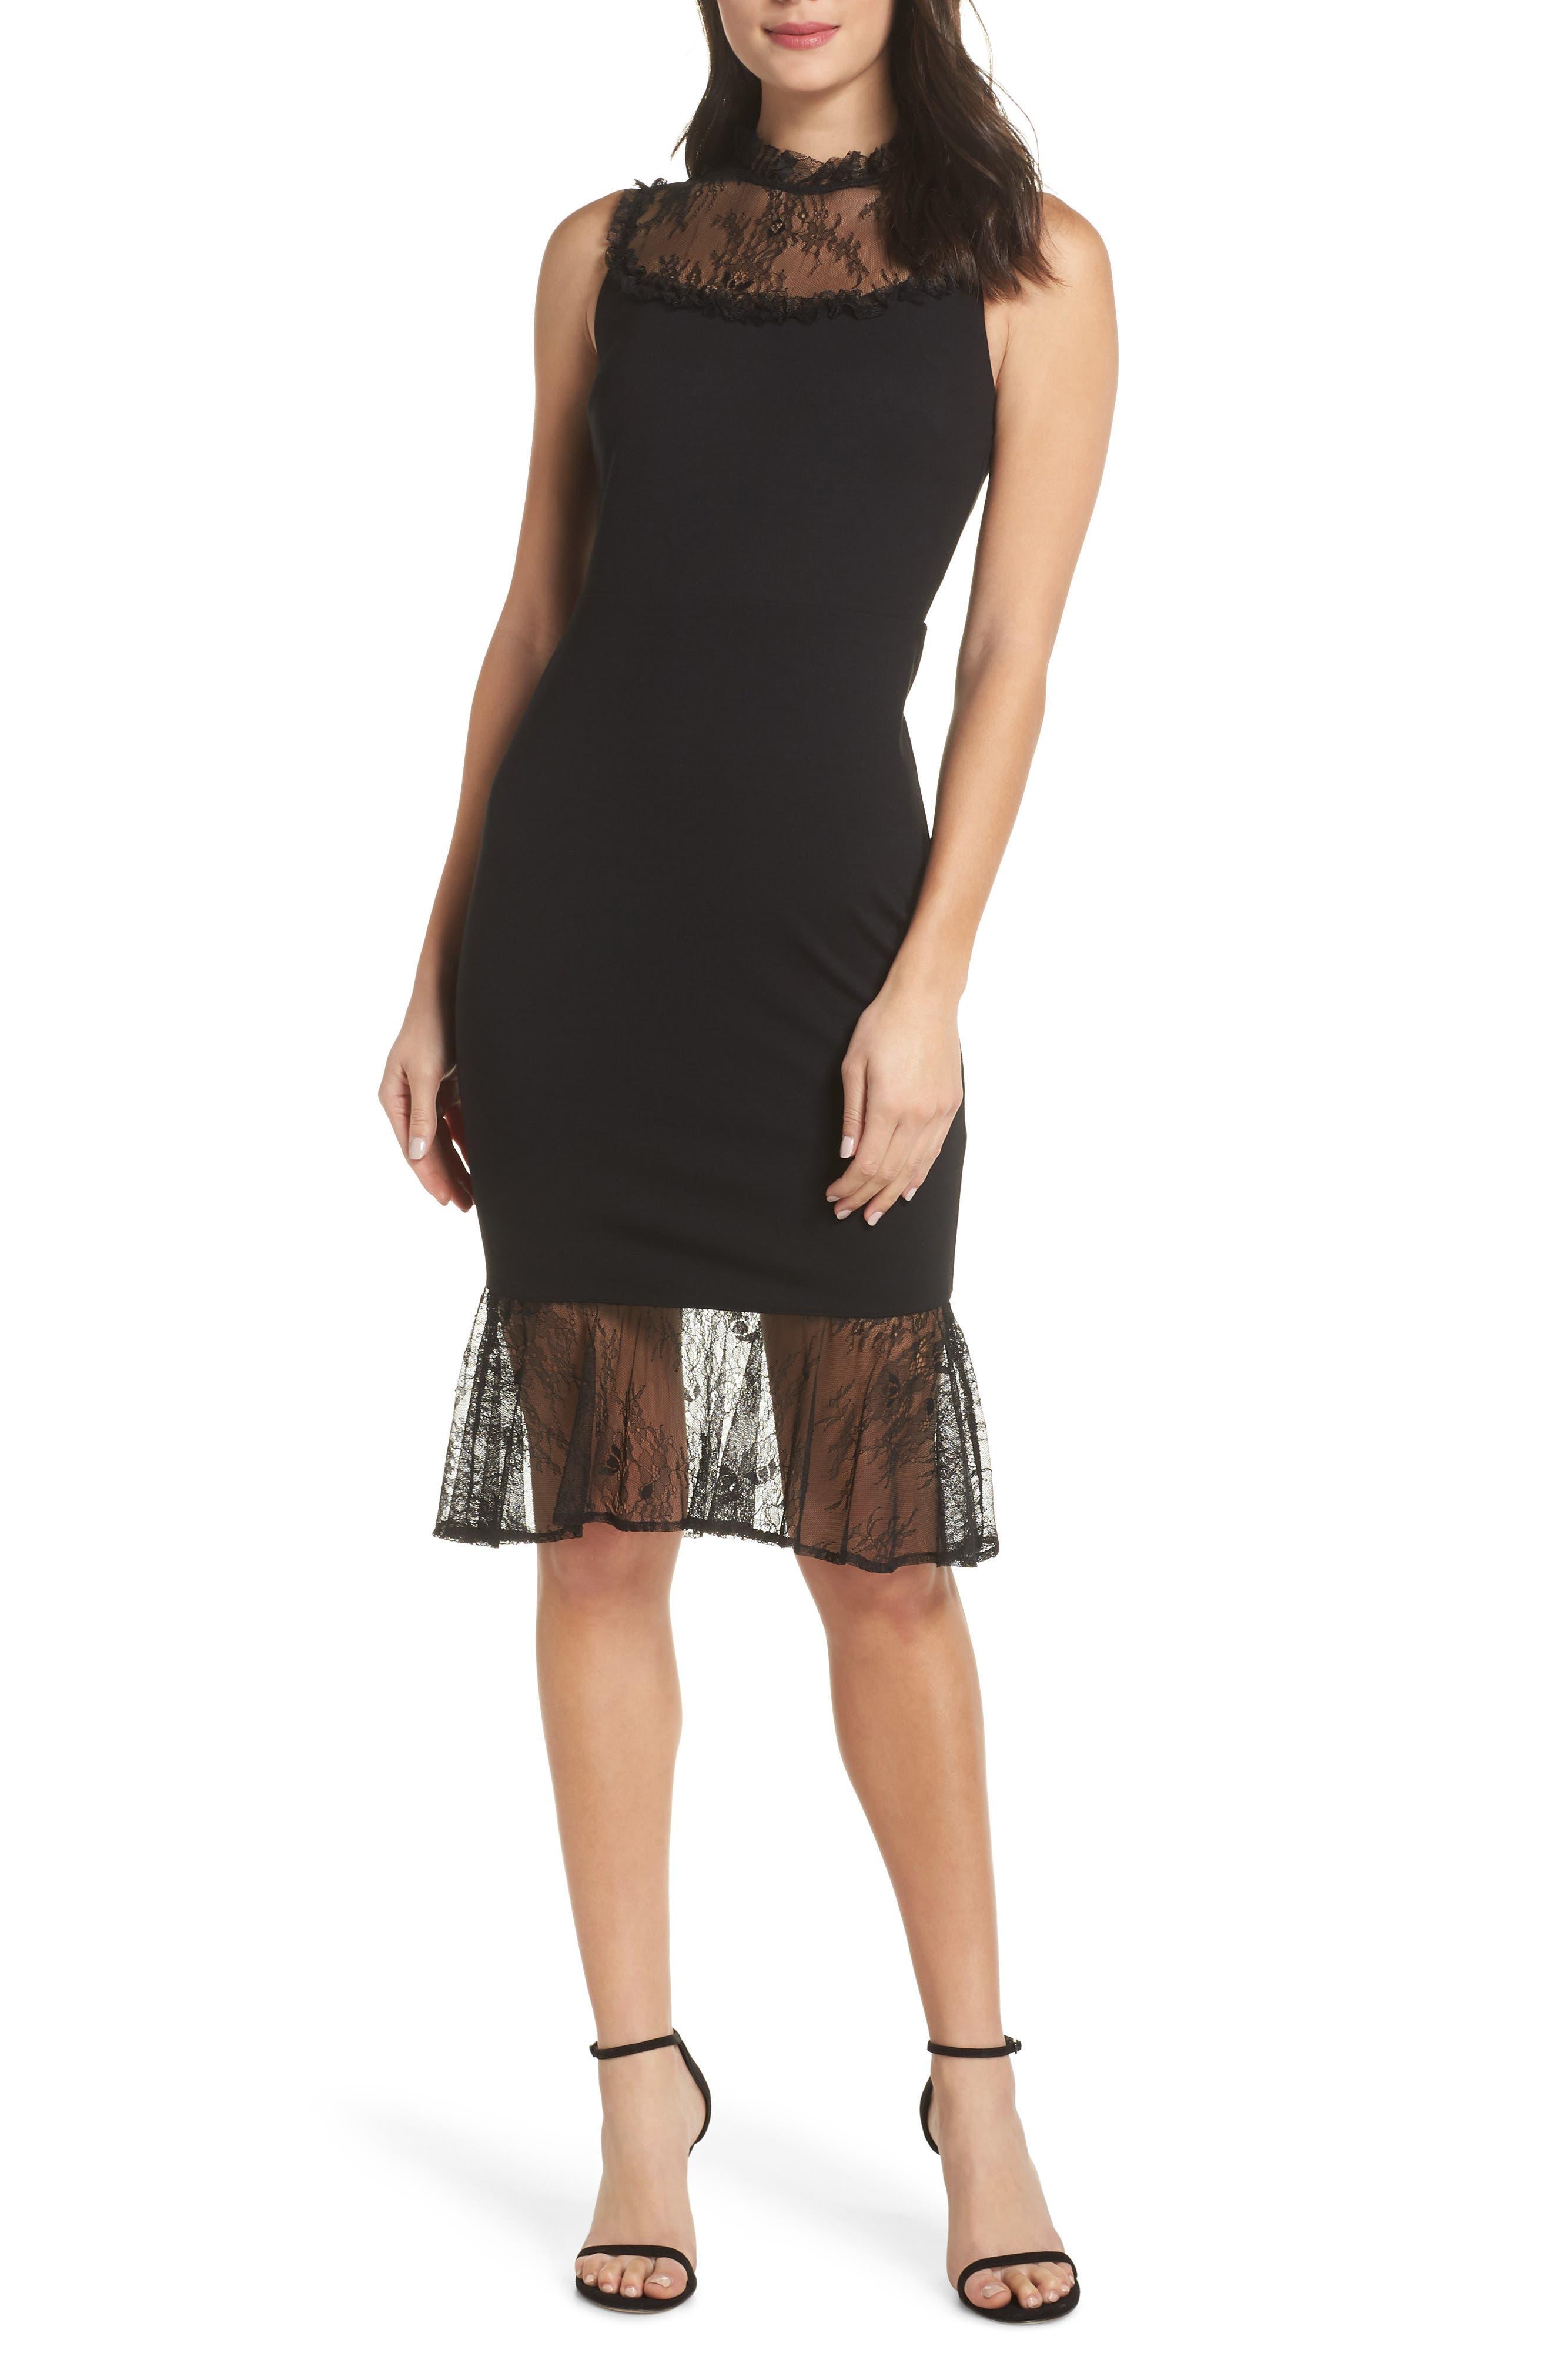 Ali & Jay Two To Tango Lace Detail Dress, Black